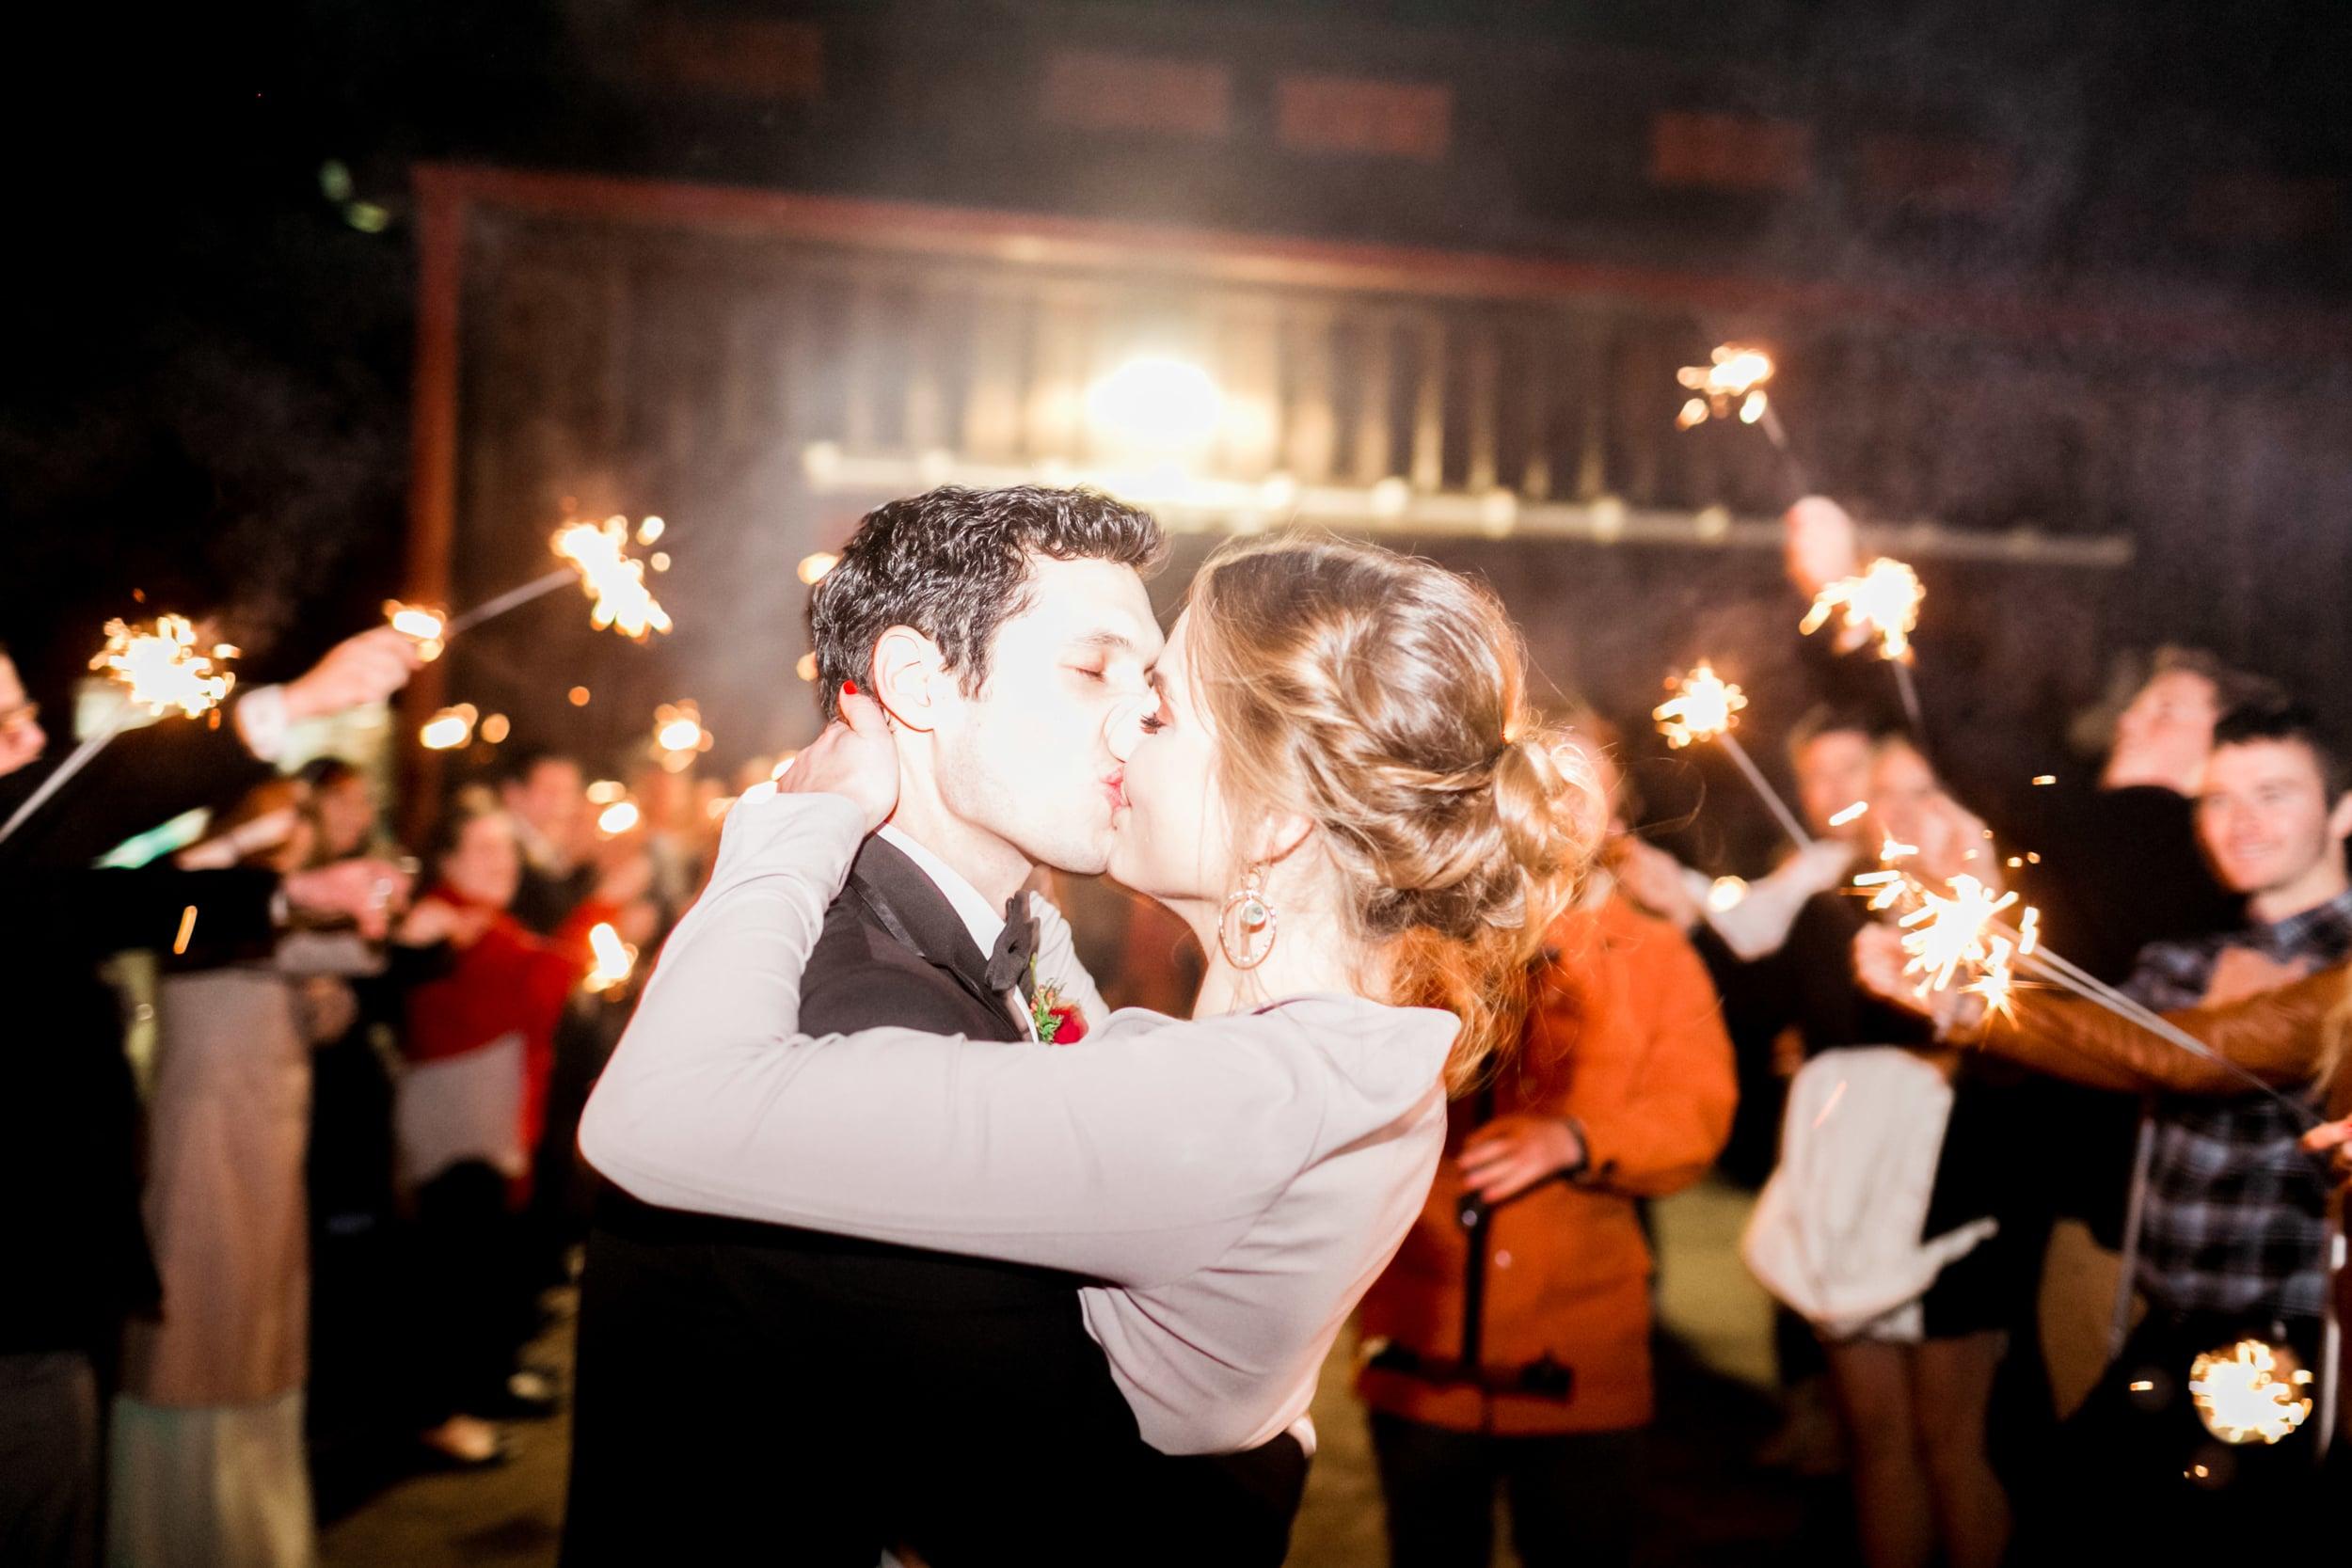 Natalie_Schutt_Photography_Winter_Wedding_San_Luis_Obispo-222.jpg